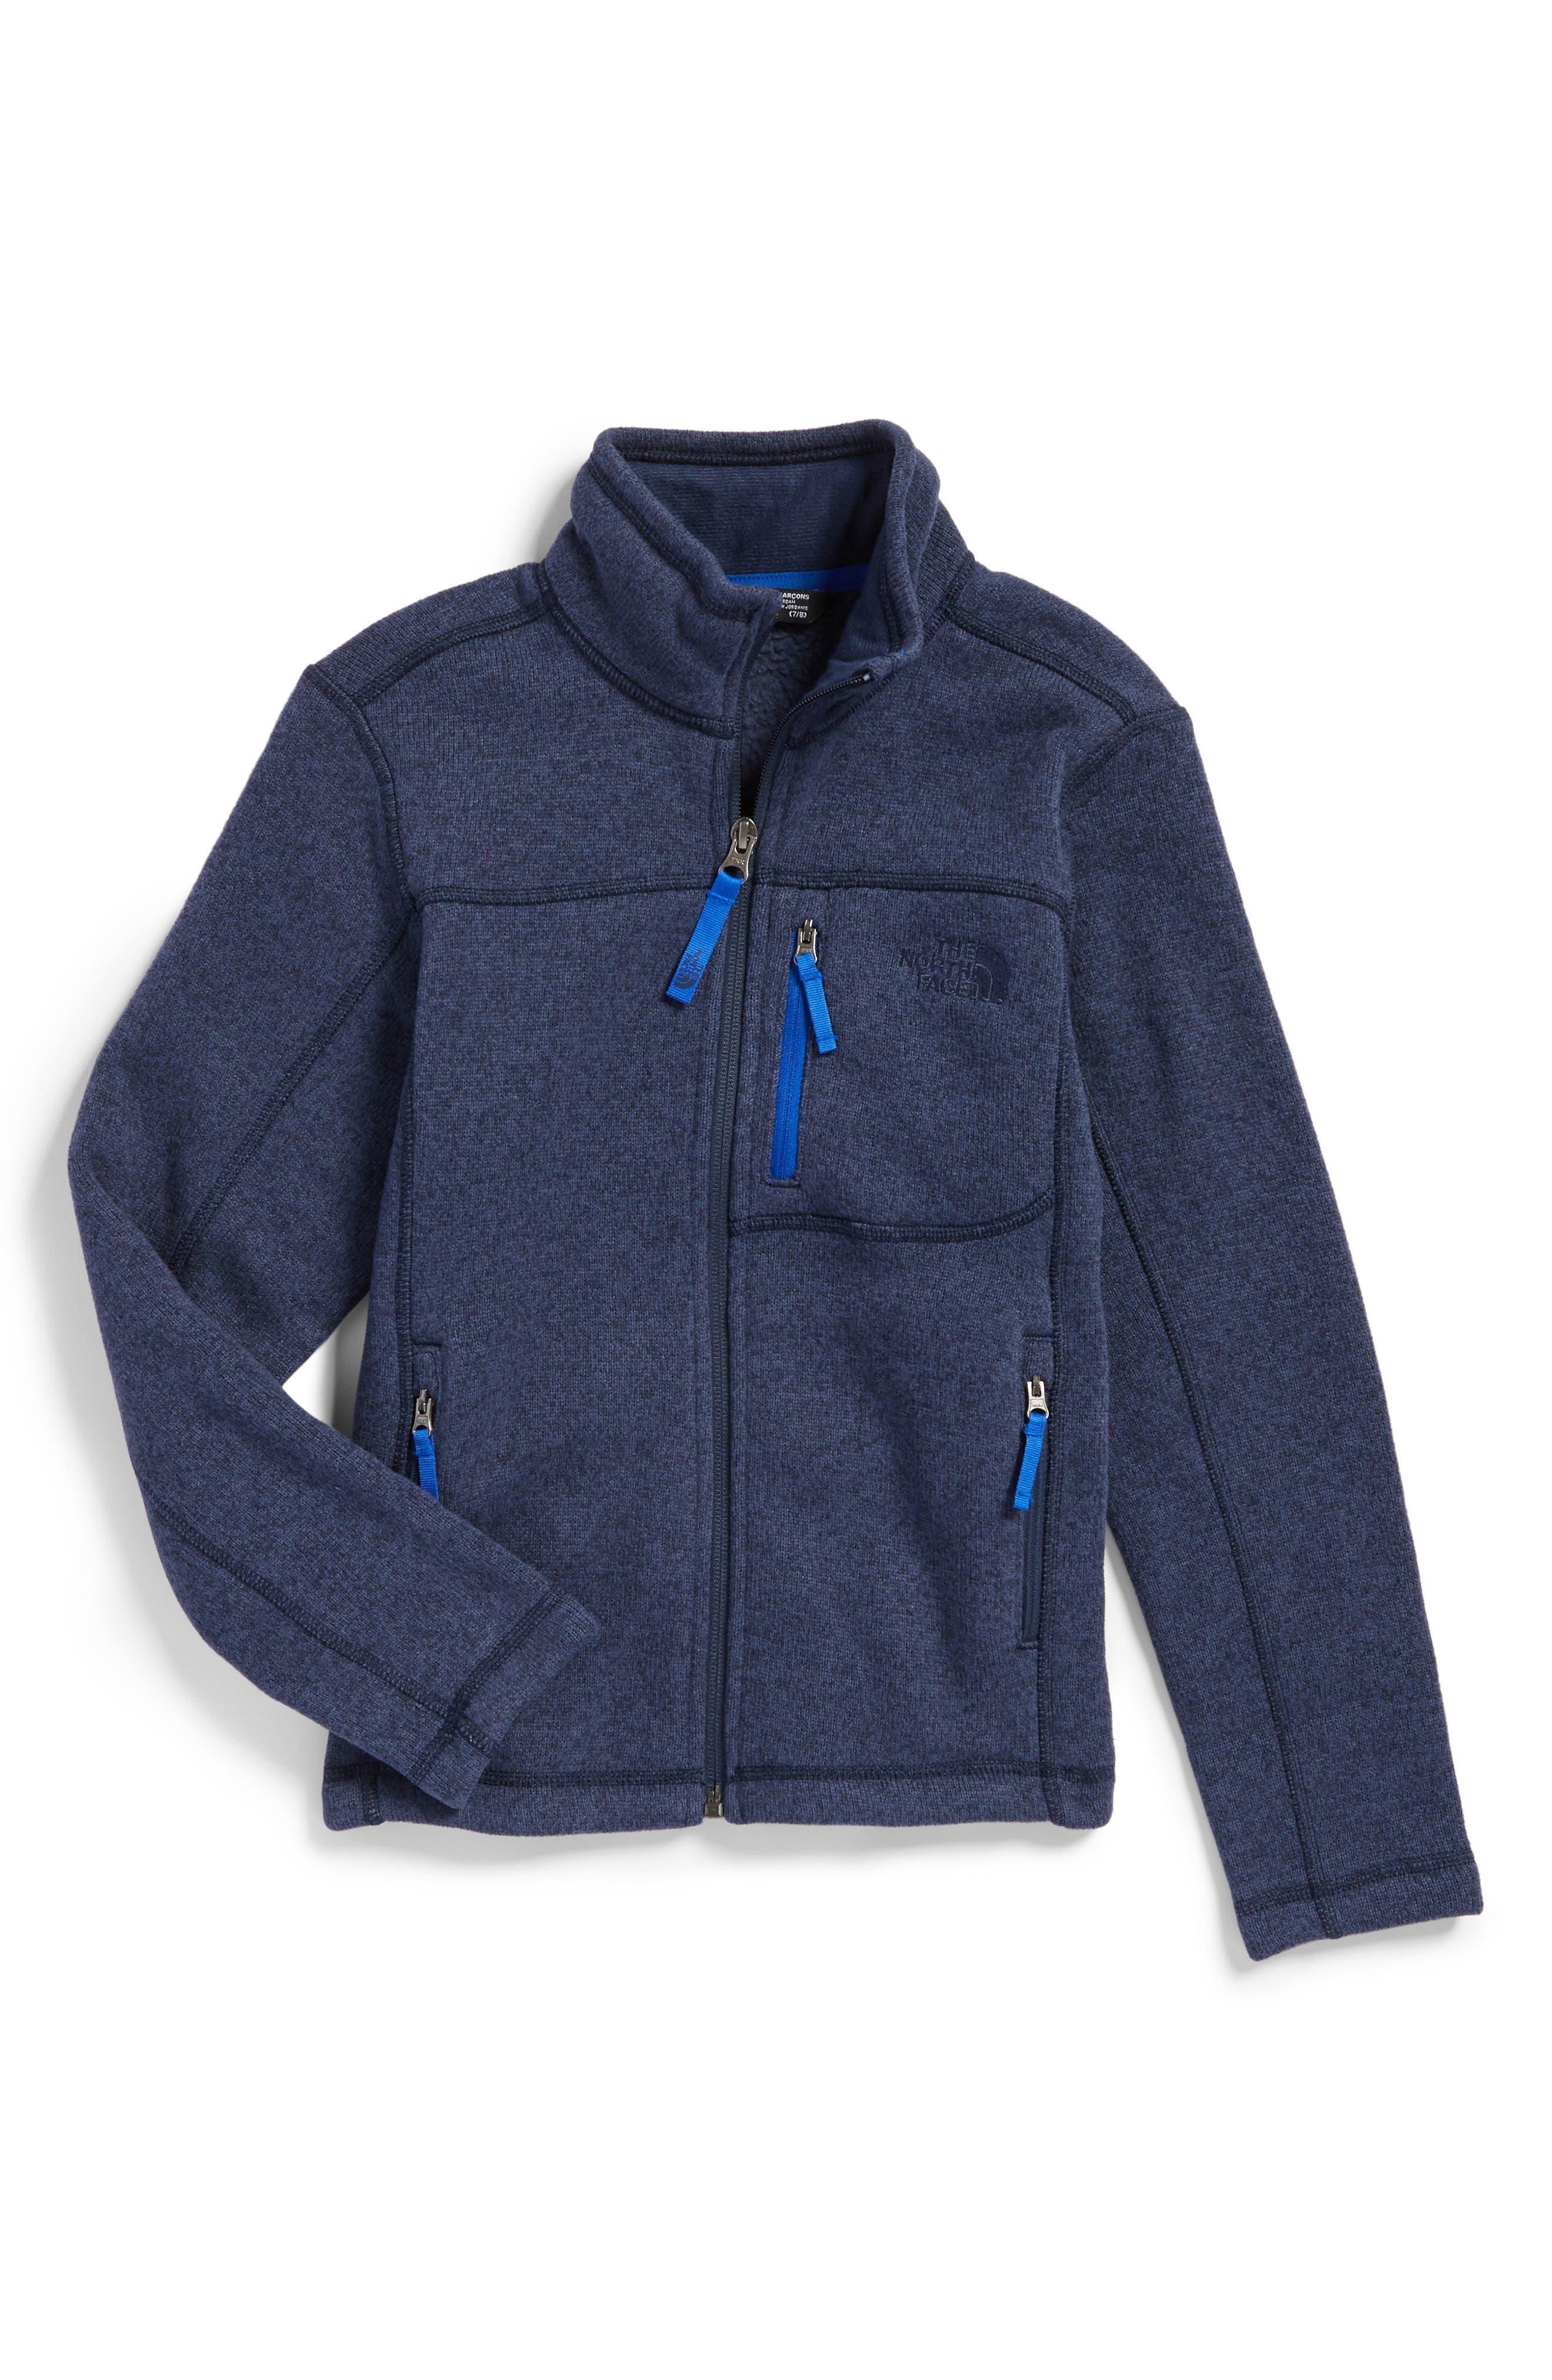 Gordon Lyons Sweater Fleece Zip Jacket,                             Main thumbnail 1, color,                             Cosmic Blue Heather